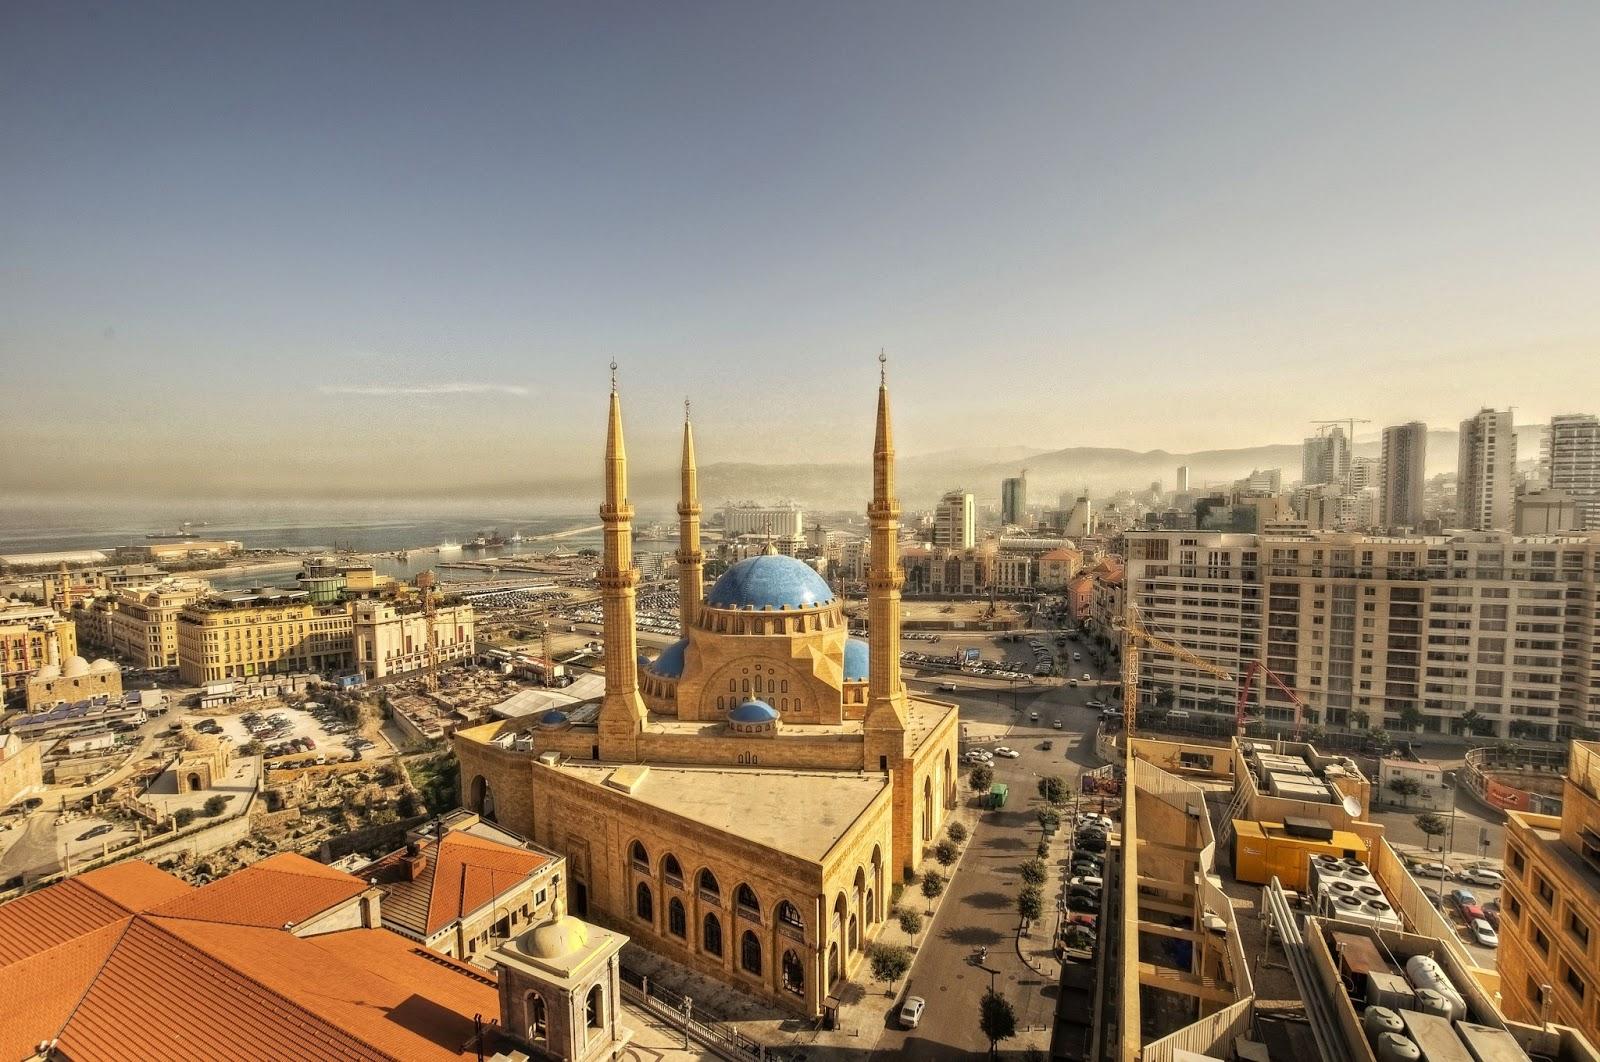 Beirut Lebanon  city photos gallery : Beirut, Lebanon – Travel guide and Travel info | Tourist ...